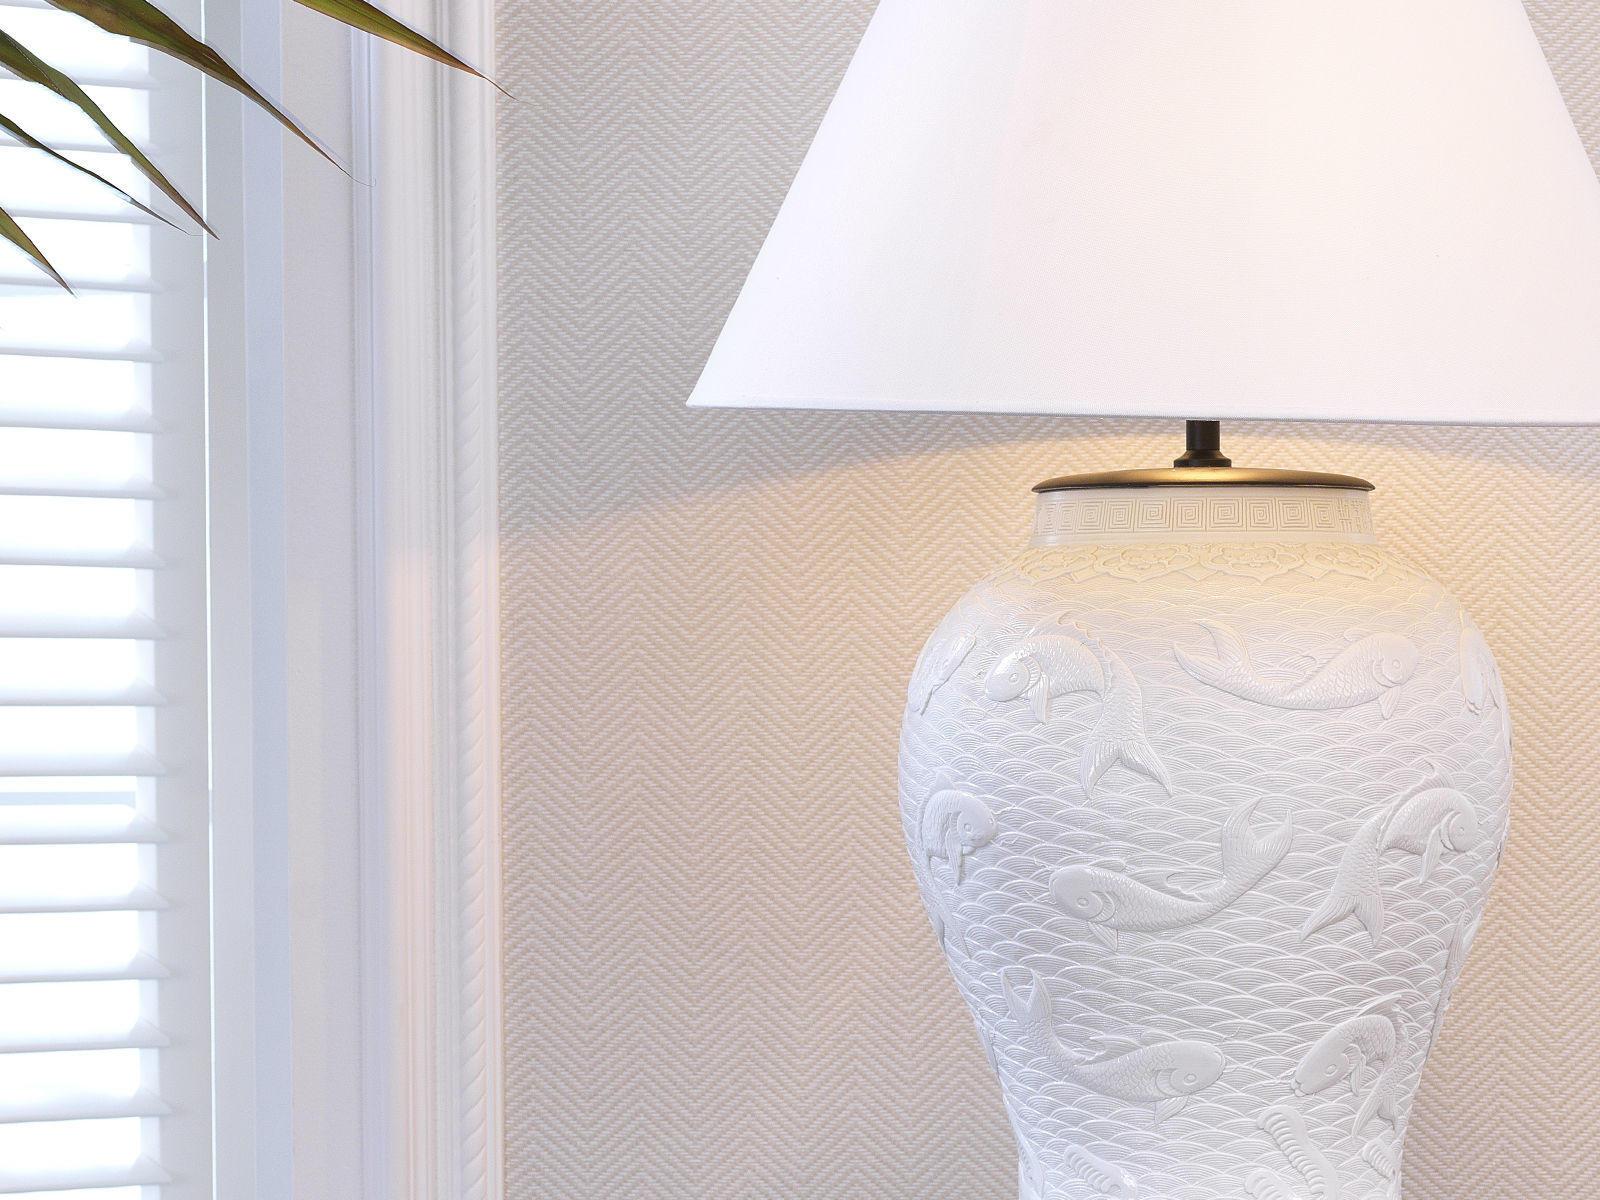 Lighting with ceramic detail